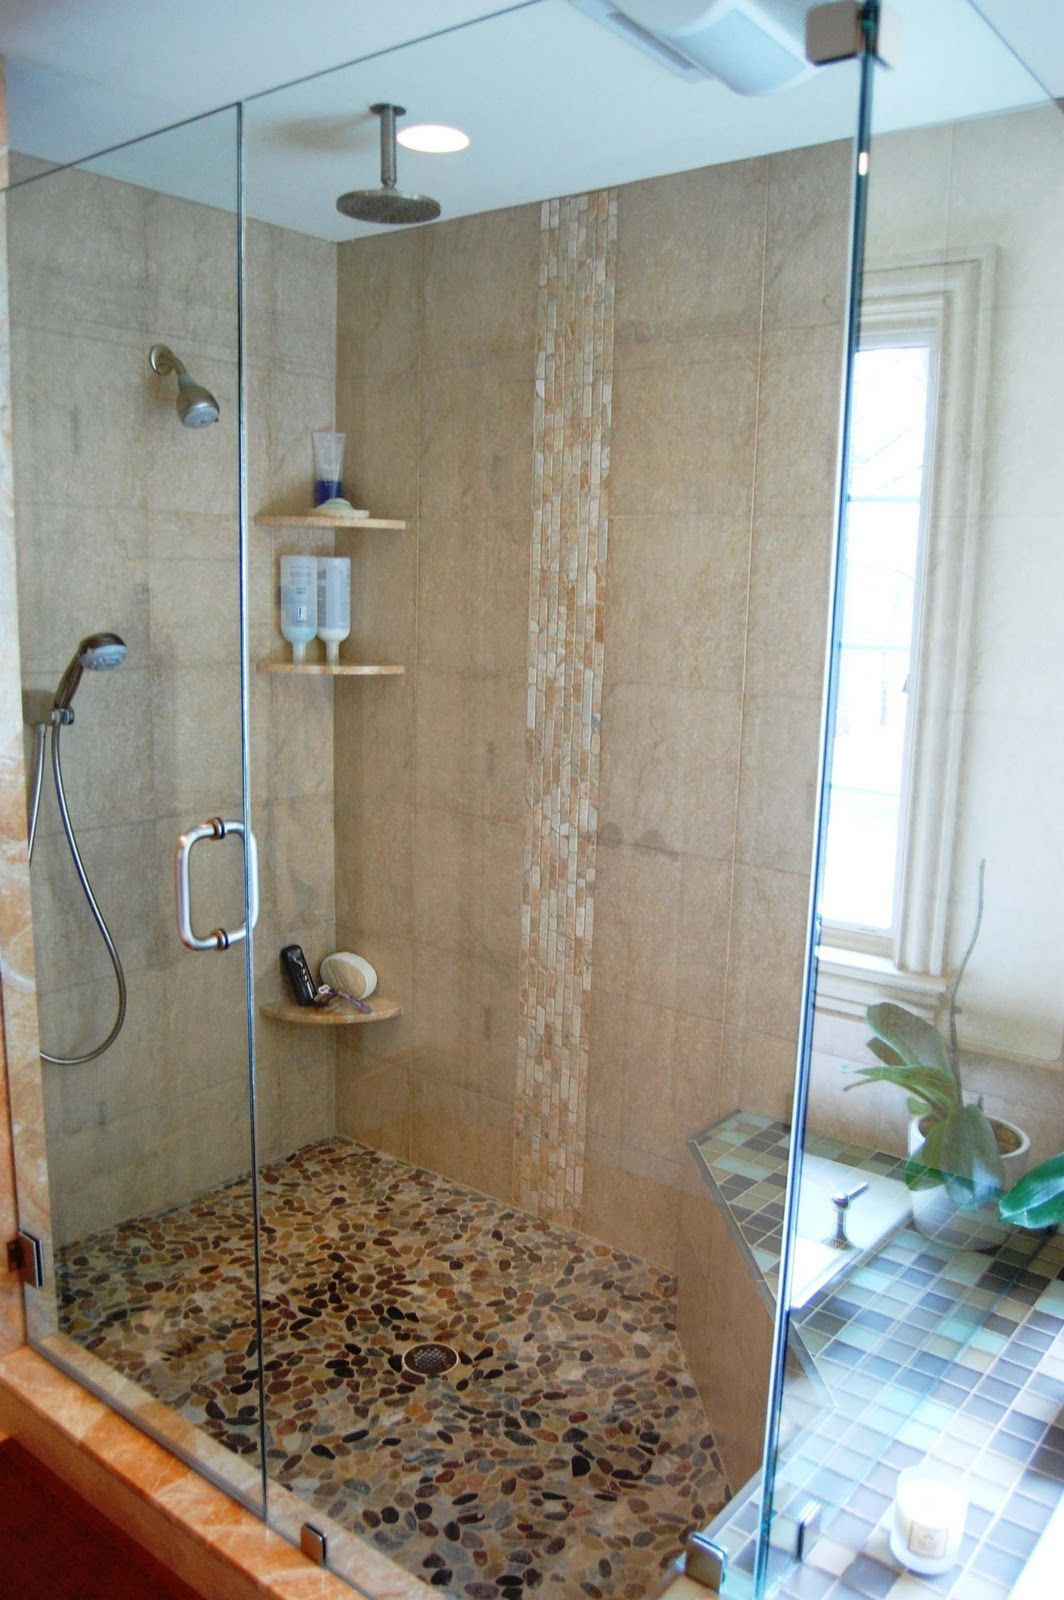 Bathroom shower ideas waterfall bedroom ideas interior design  baths  Pinterest  Bedrooms